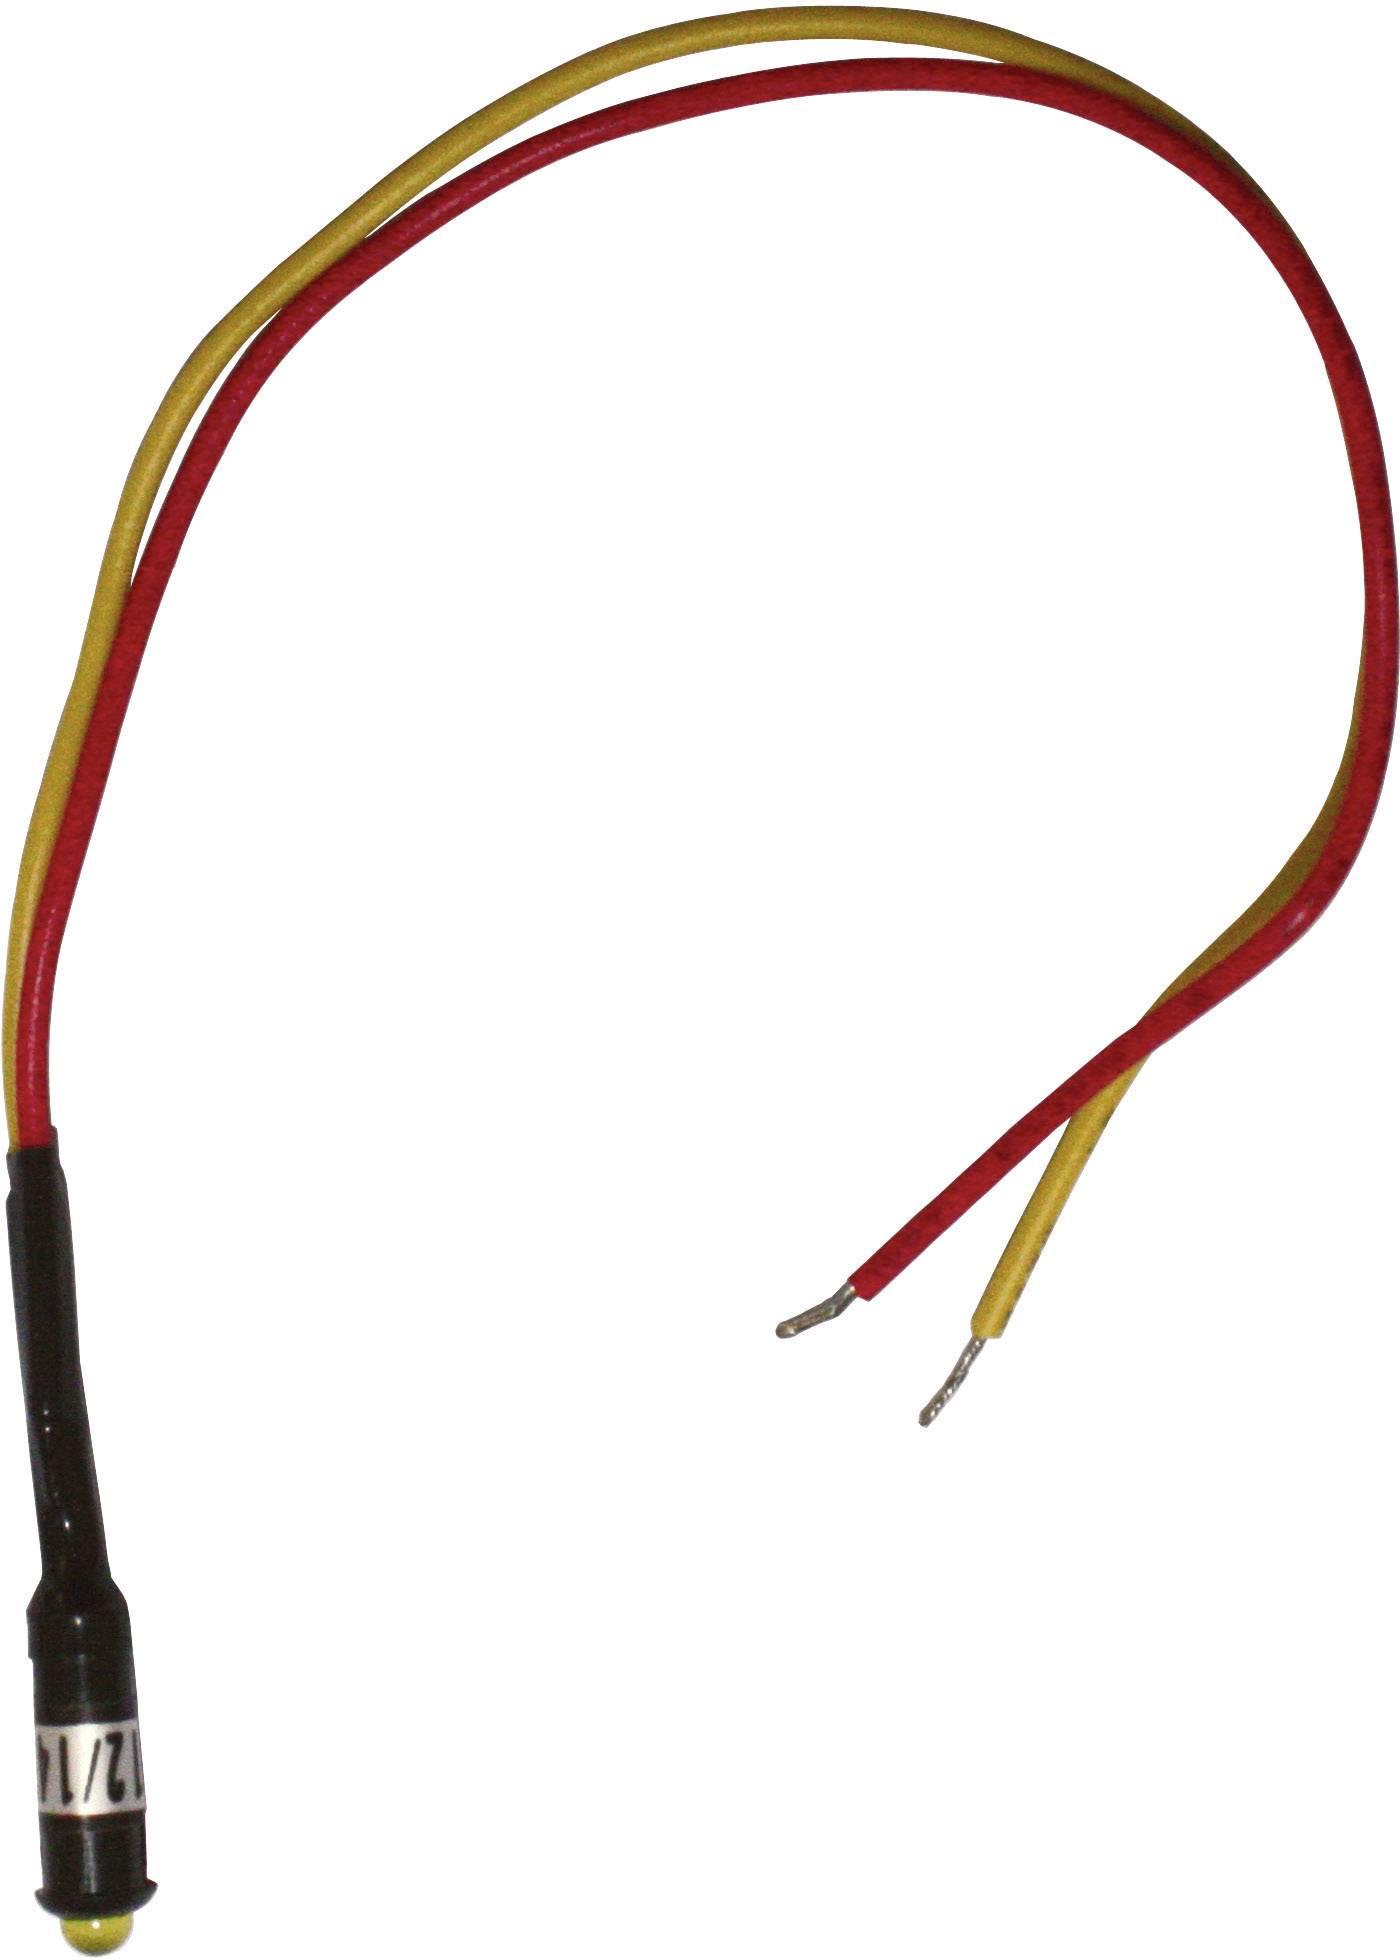 IndikačnéLED Barthelme 52052811, 24 V/DC, červená